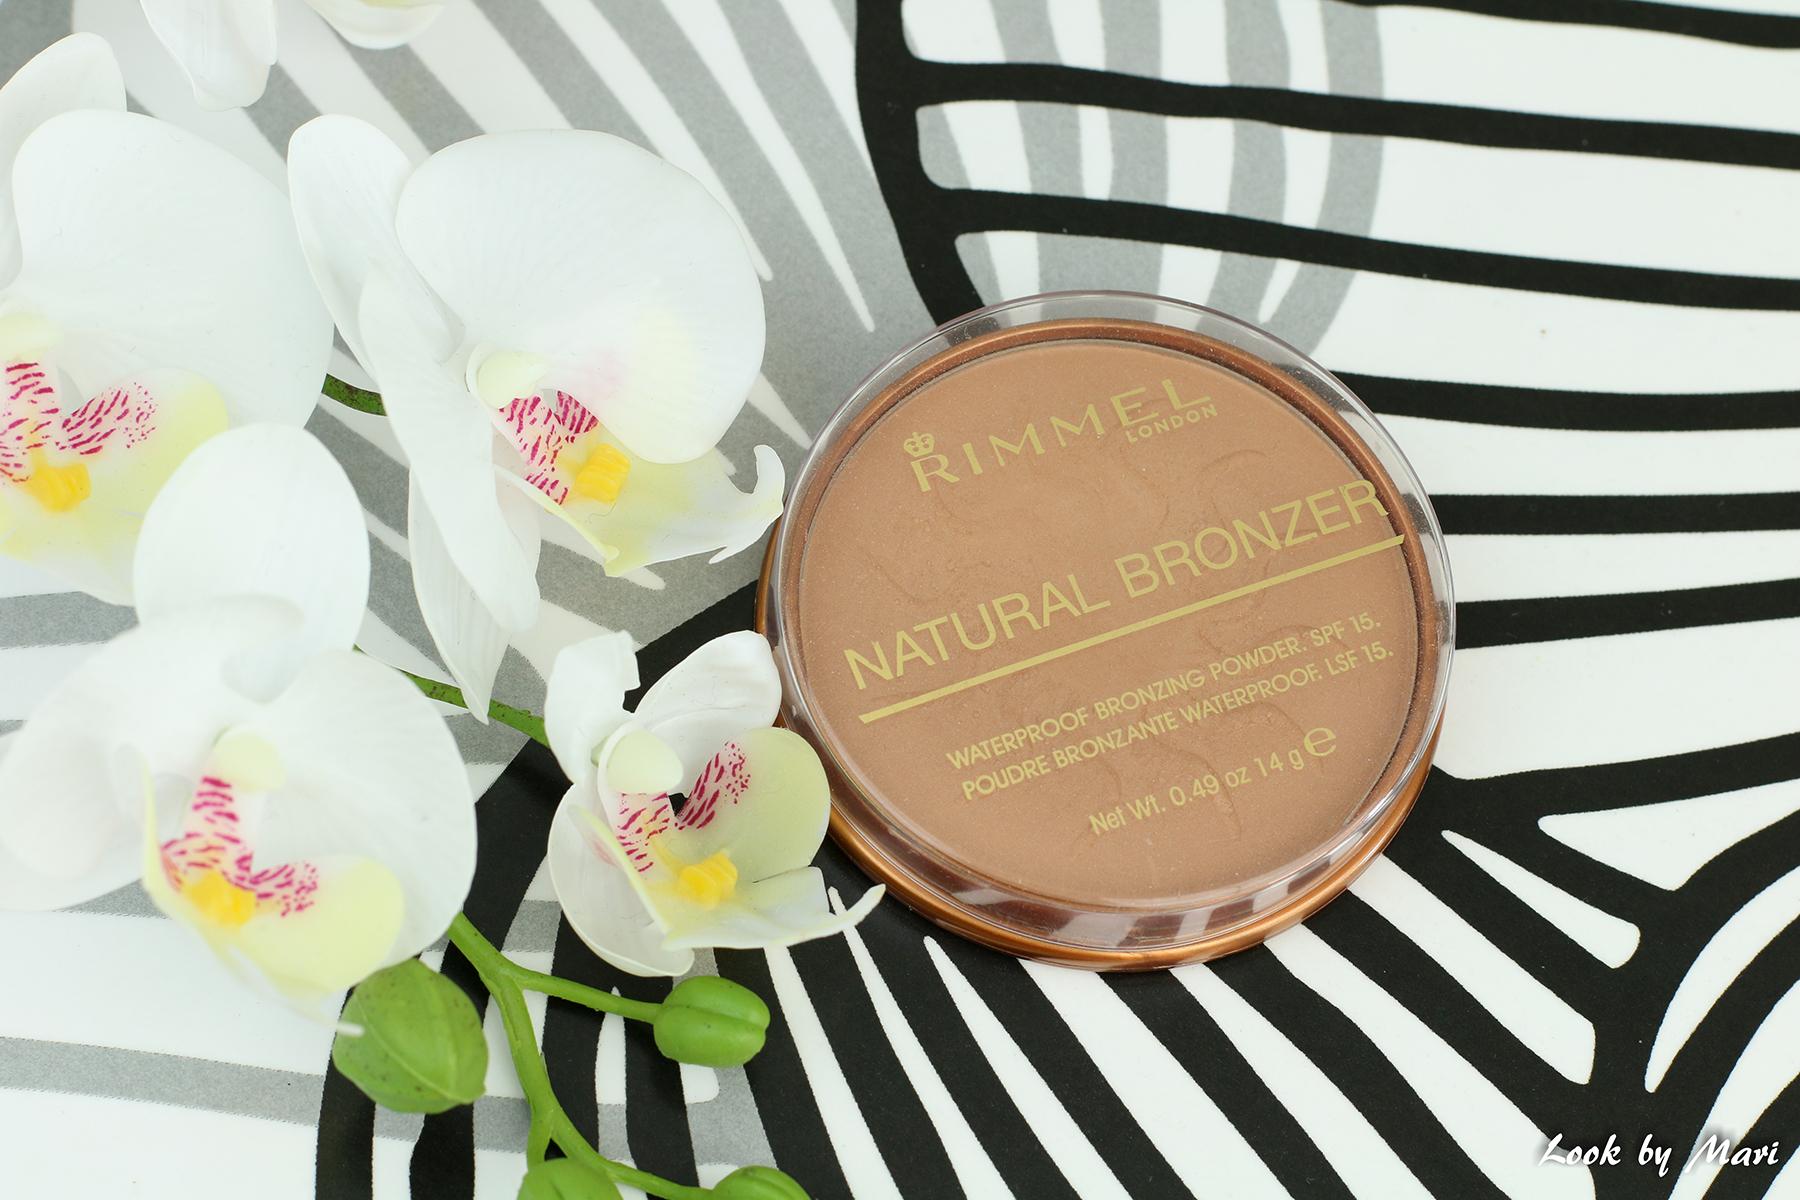 9 rimmel natural bronzer 21 review kokemuksia paras aurinkopuuteri kalpealle iholle